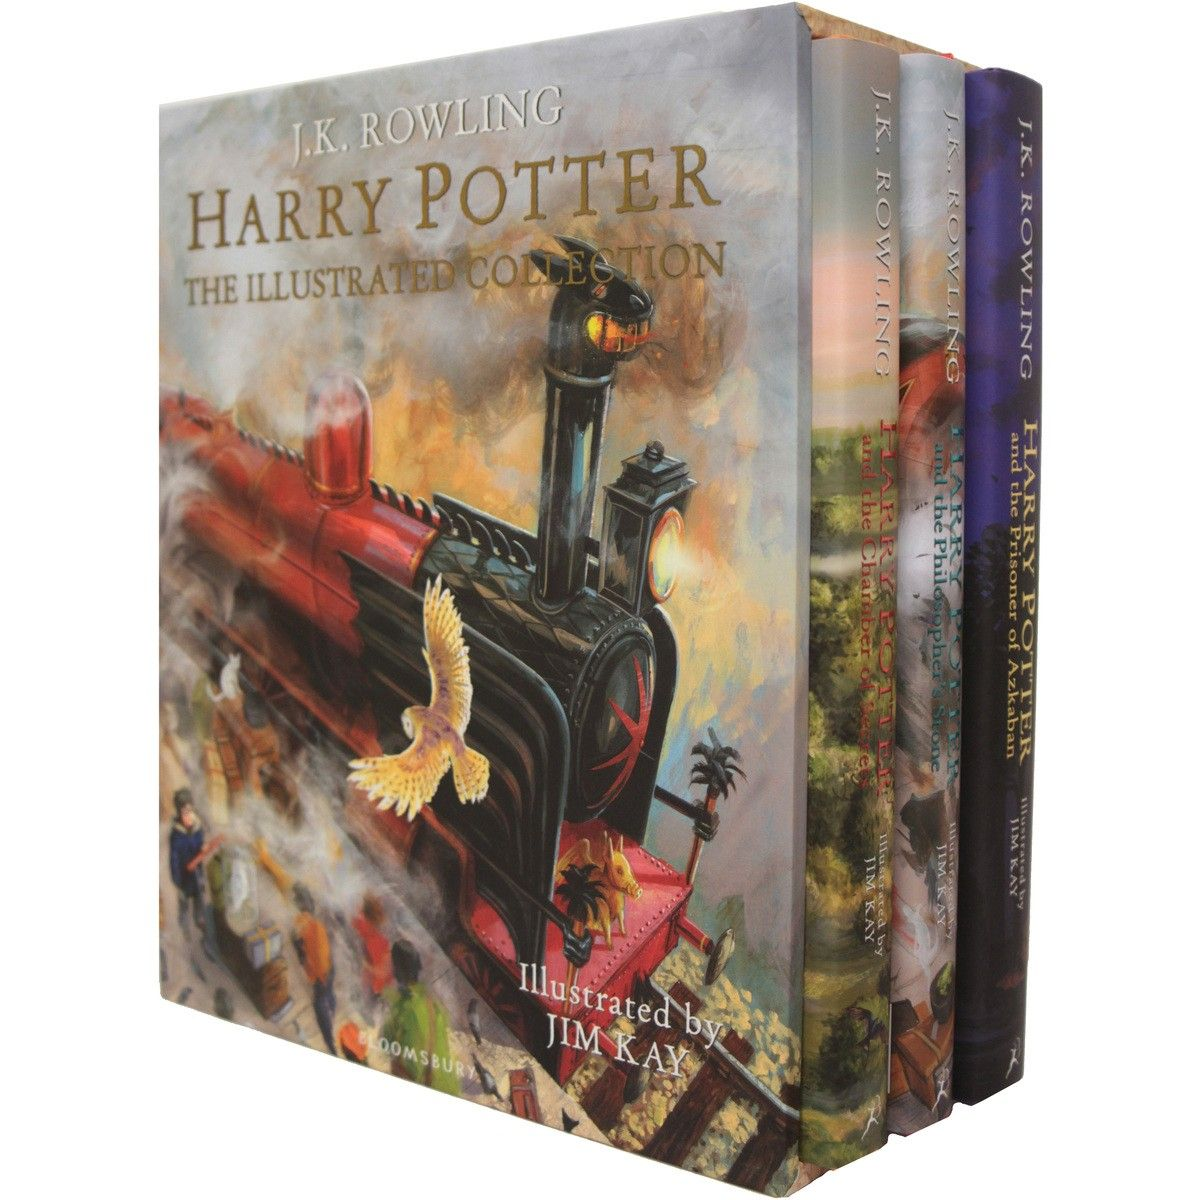 Pin By Hansyah1296 On Books Kingdom Harry Potter Book Set Harry Potter Illustrations Harry Potter